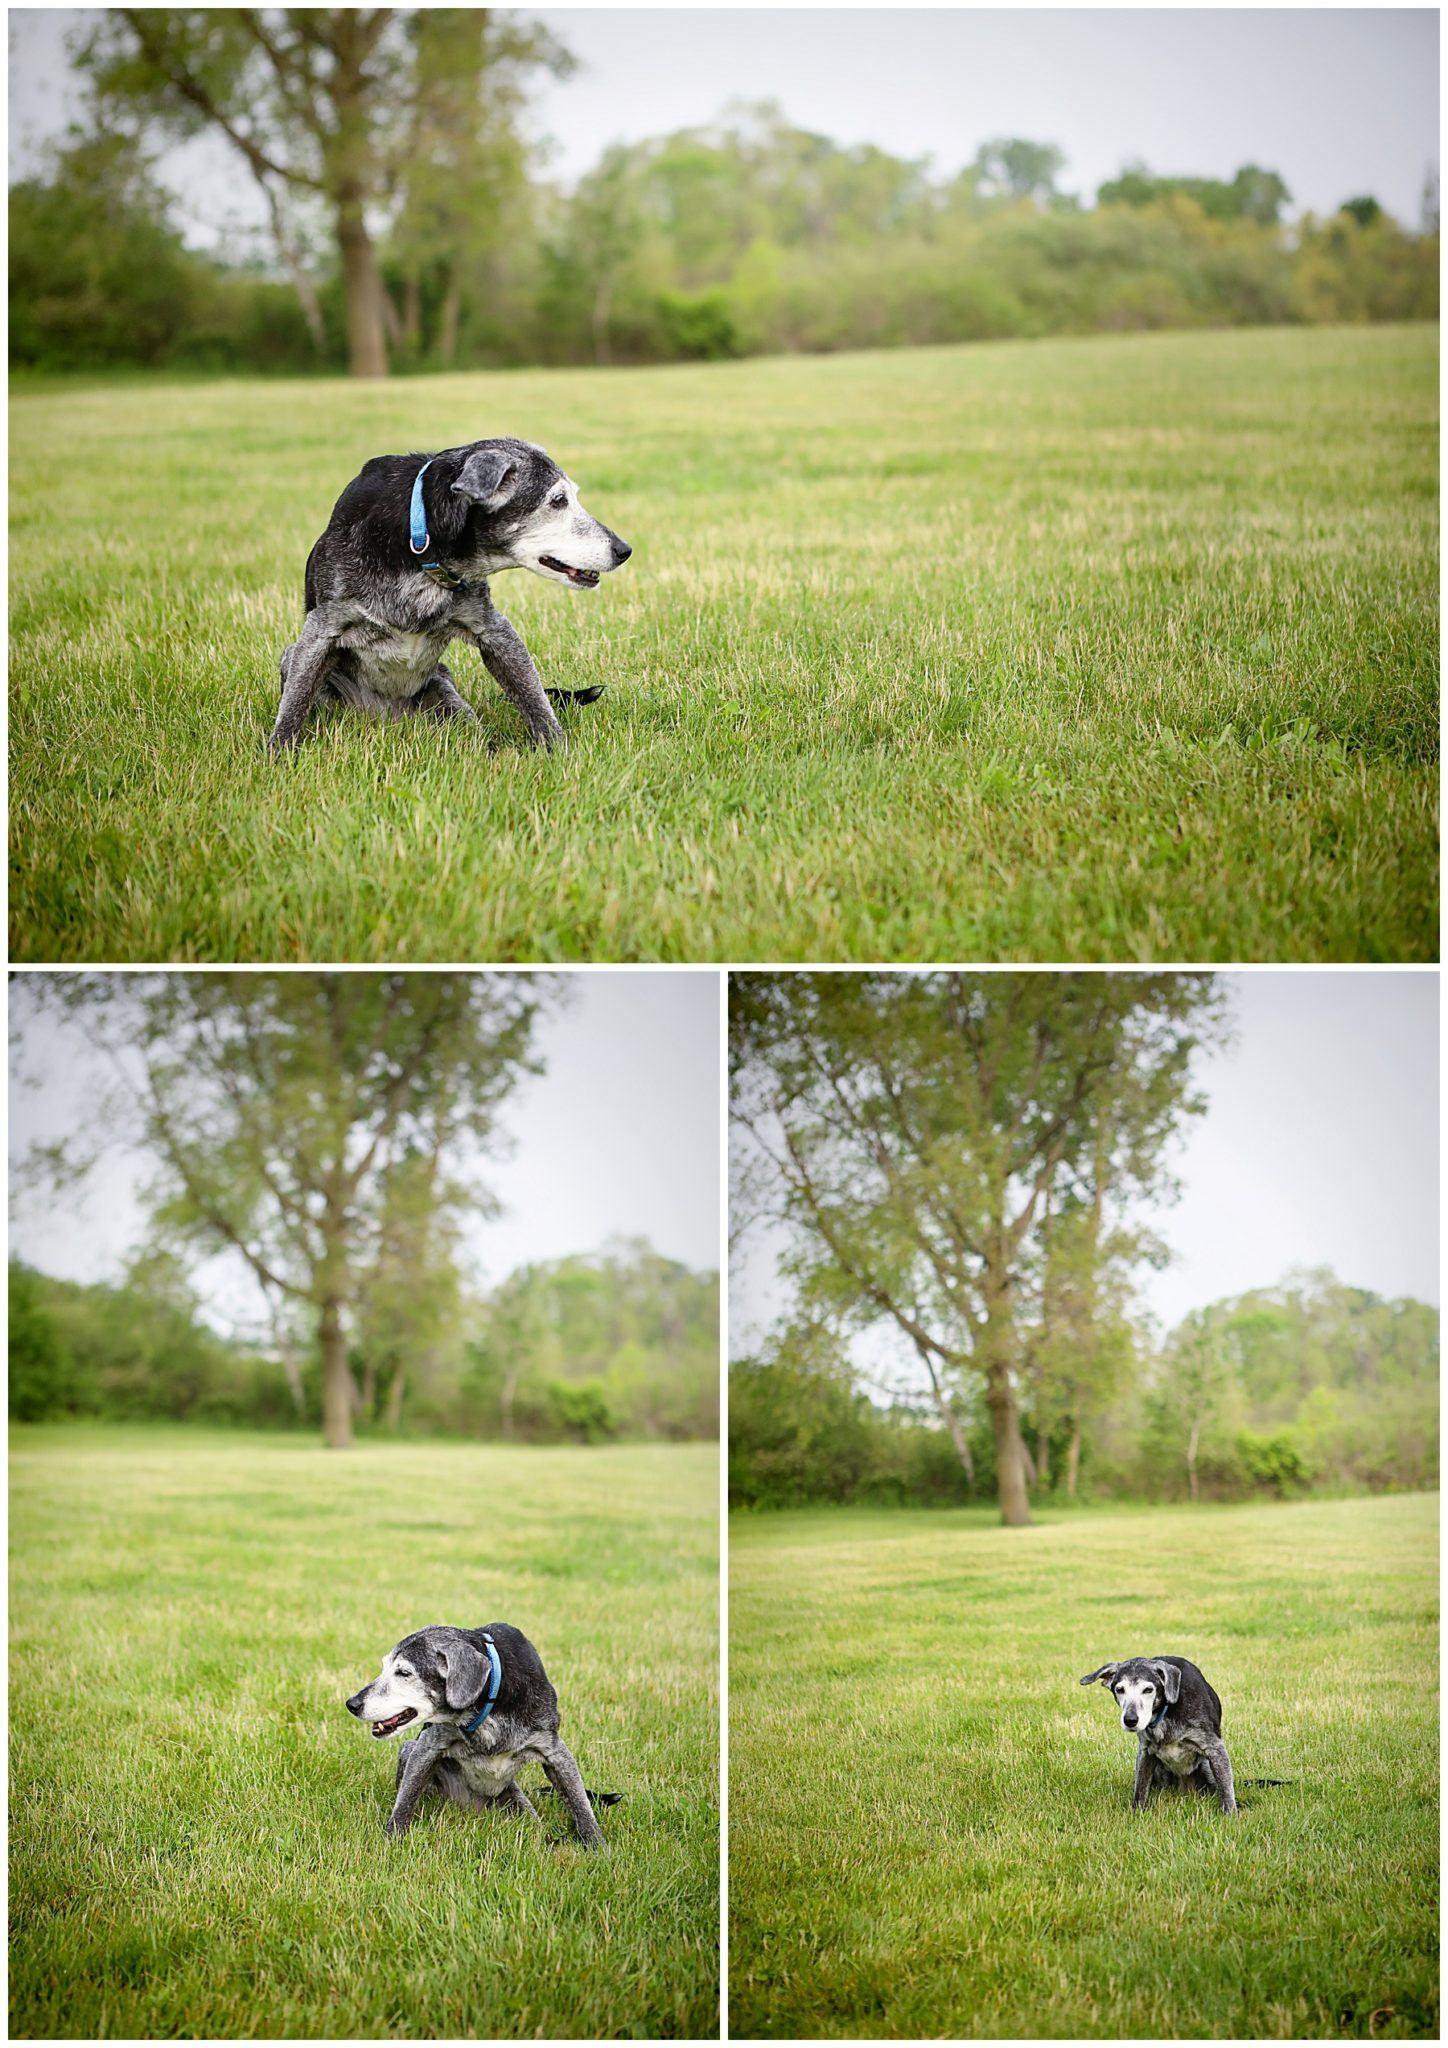 Losing my dog